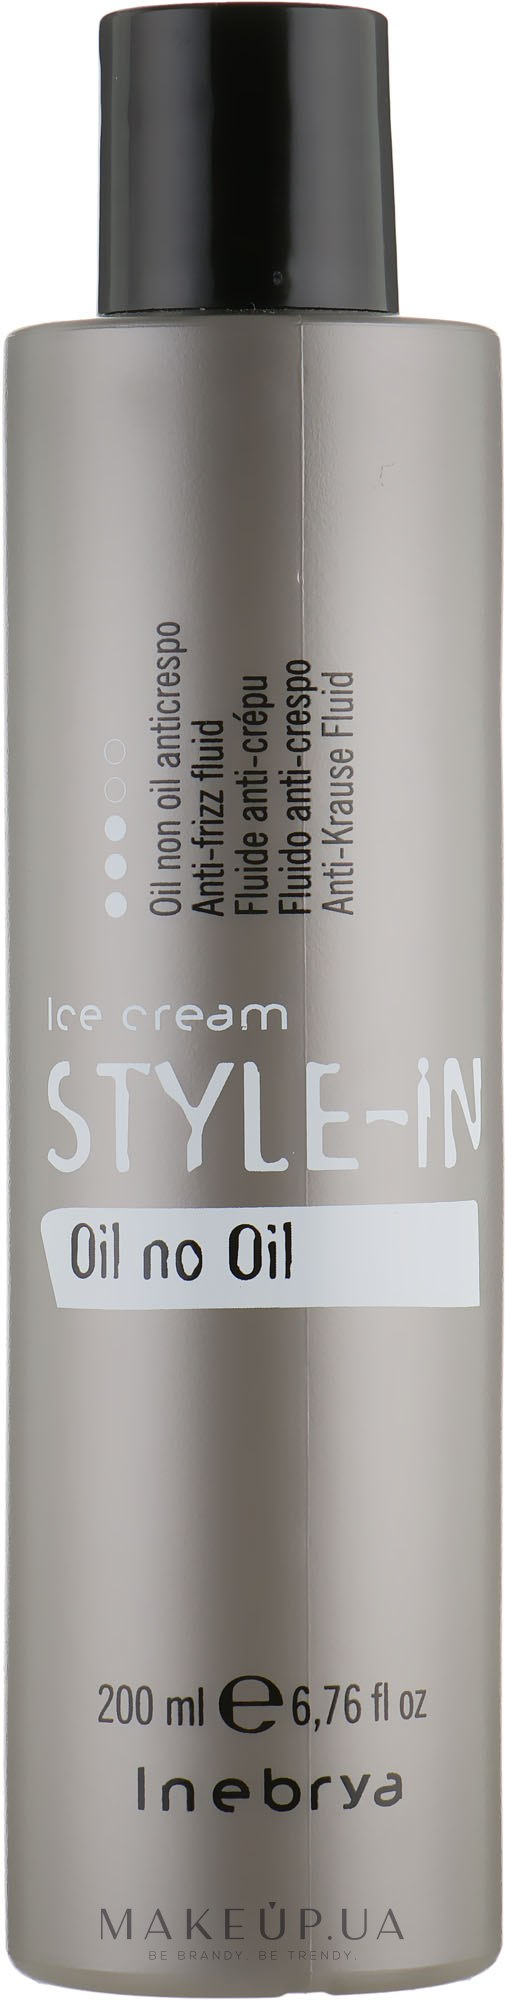 Флюид для выпрямления вьющихся и пушащихся волос - Inebrya Style-In Oil Non Oil — фото 200ml